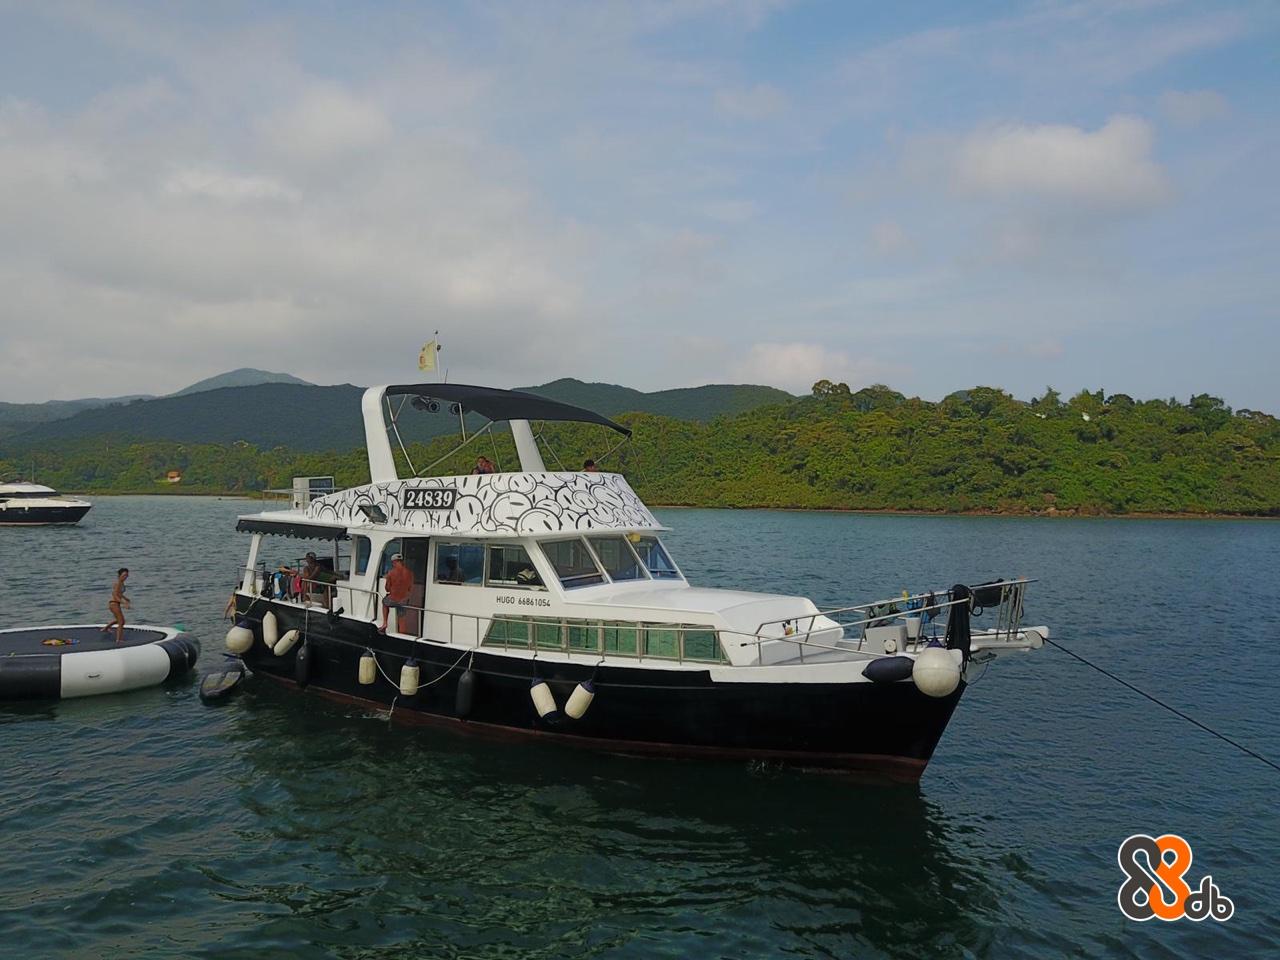 24839 HUGO 66861054  Vehicle,Water transportation,Boat,Watercraft,Pilot boat